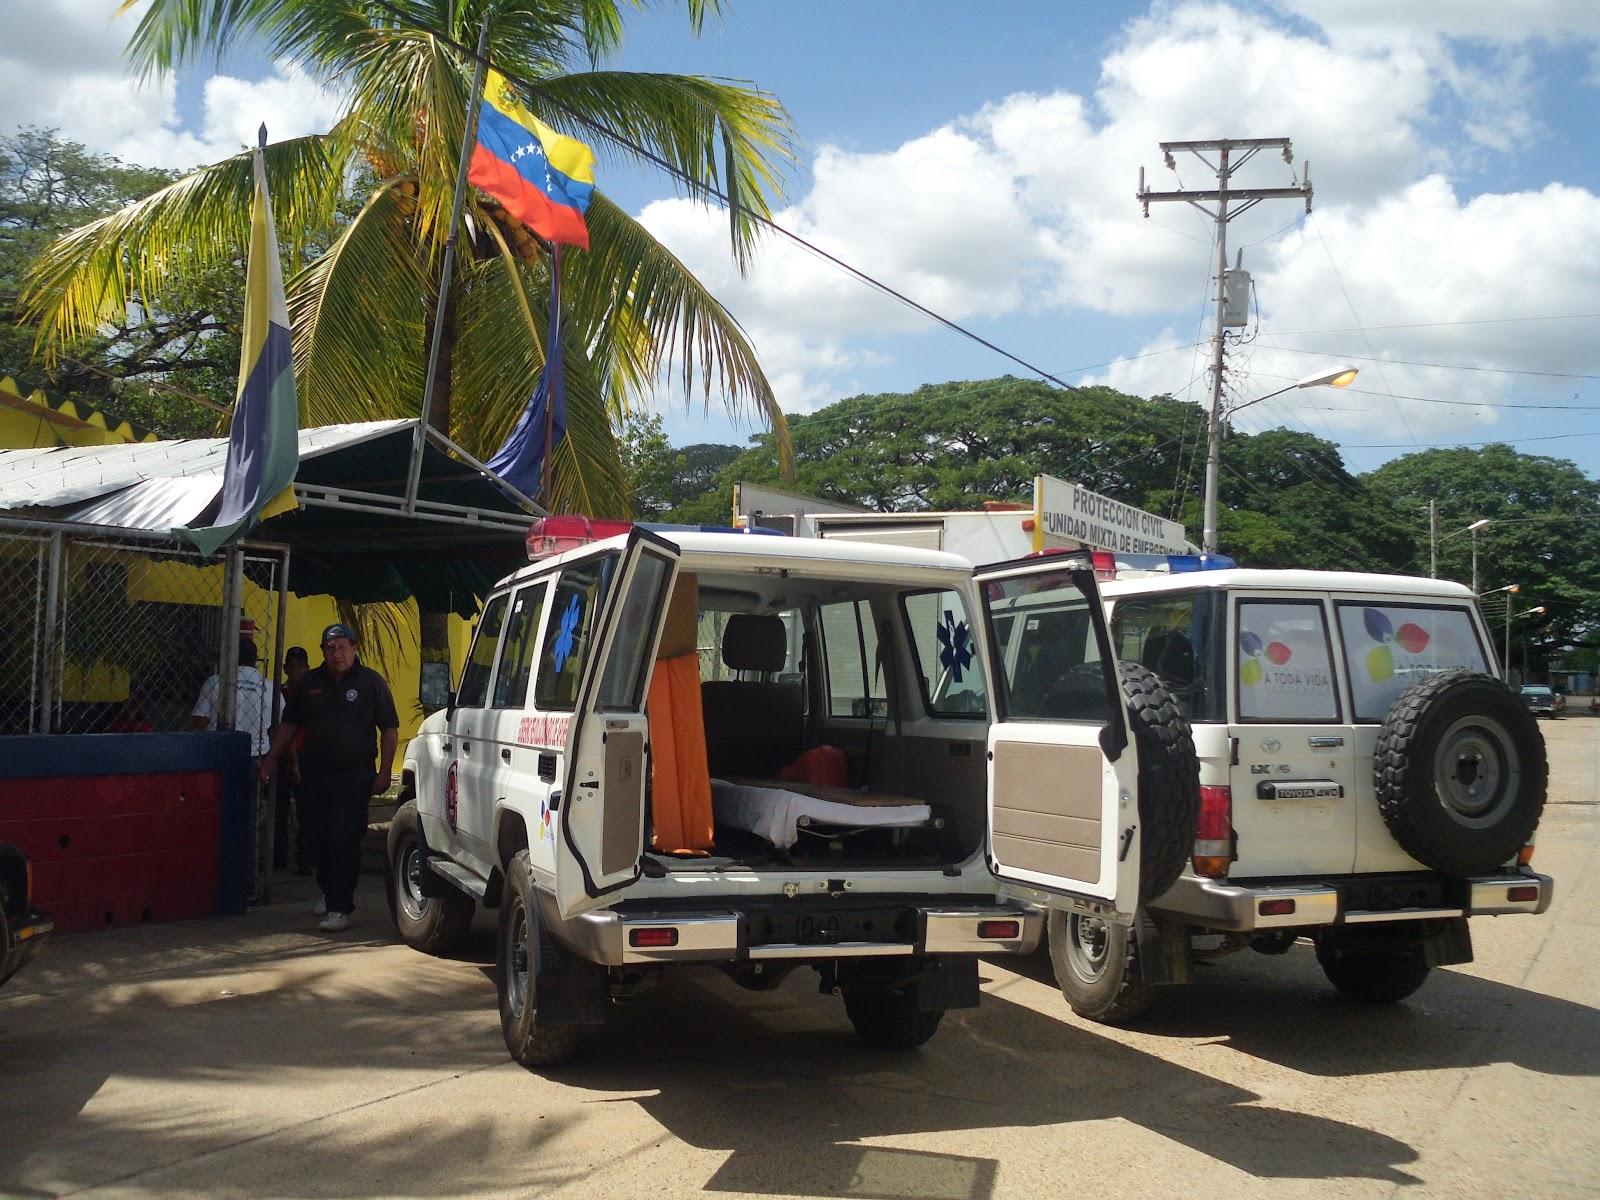 Protecci n civil apure recibi 5 unidades de emergencia for Logo del ministerio de interior y justicia